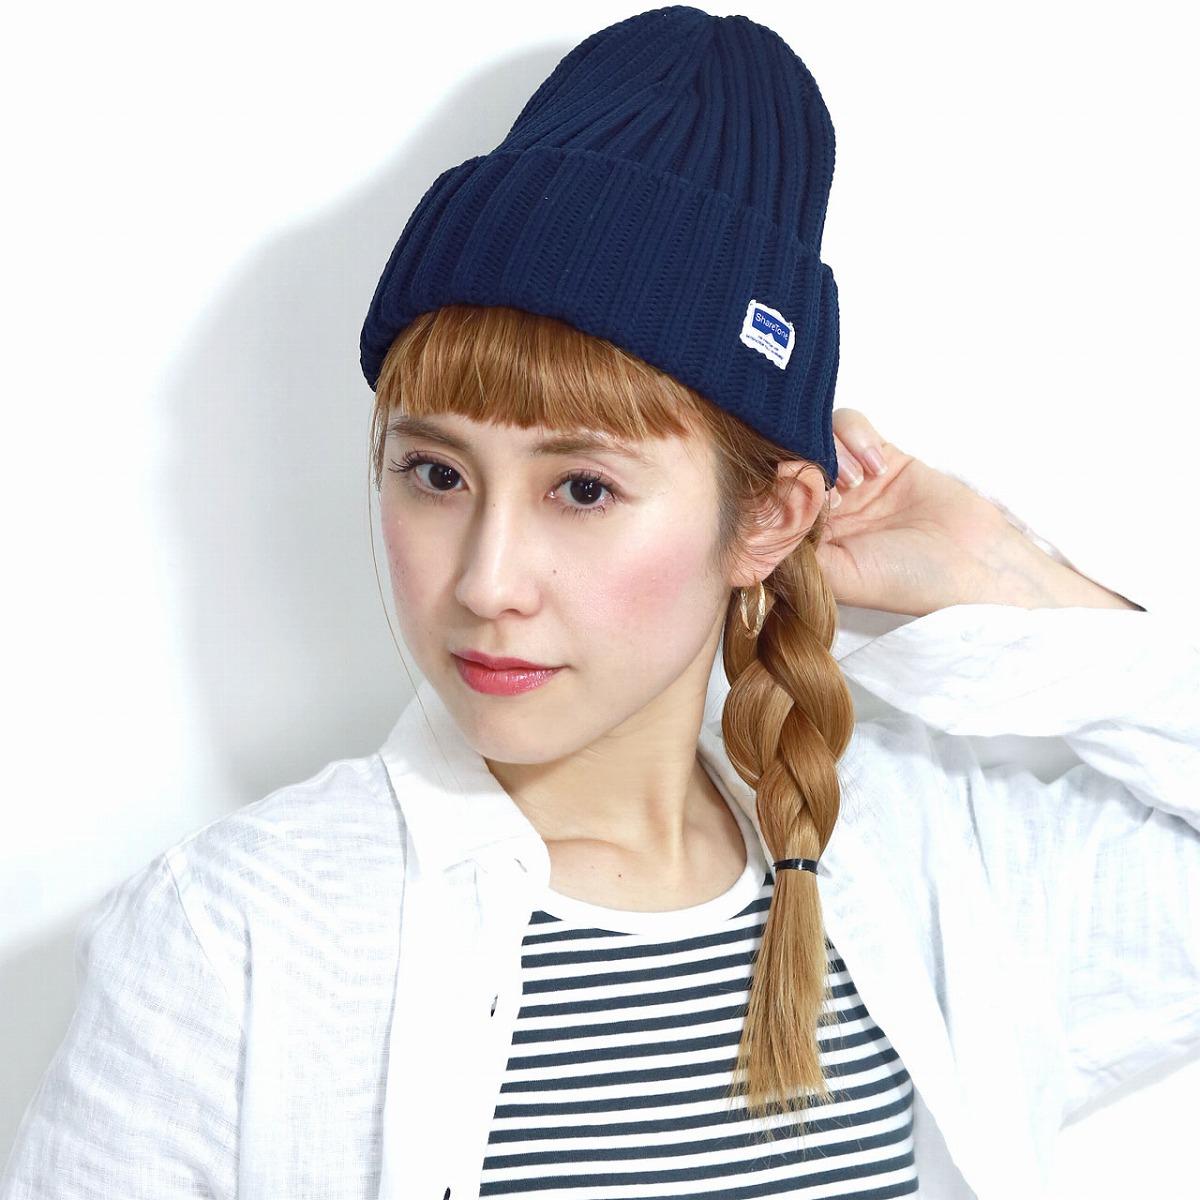 ELEHELM HAT STORE  ワッチ fast-dry light weight sports men outdoor share tone  beanie hat Lady s dark blue knit hat adjustable size unisex   navy  beanie  ... 064b0d88827